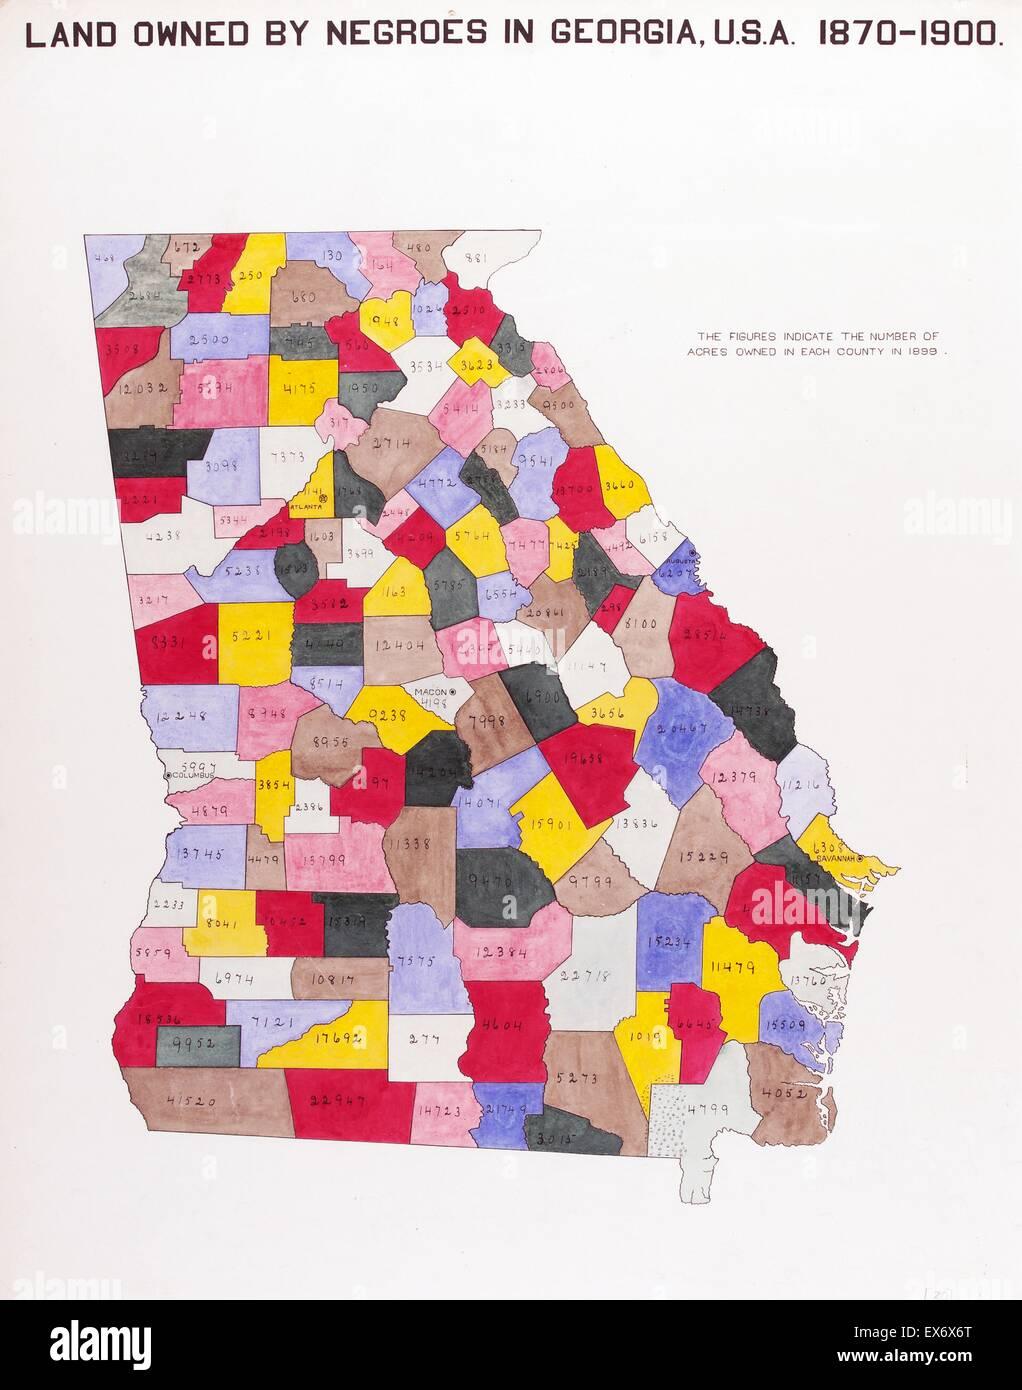 The Georgia Negro Land Owned By Negroes In Georgia USA Stock - Georgia usa map